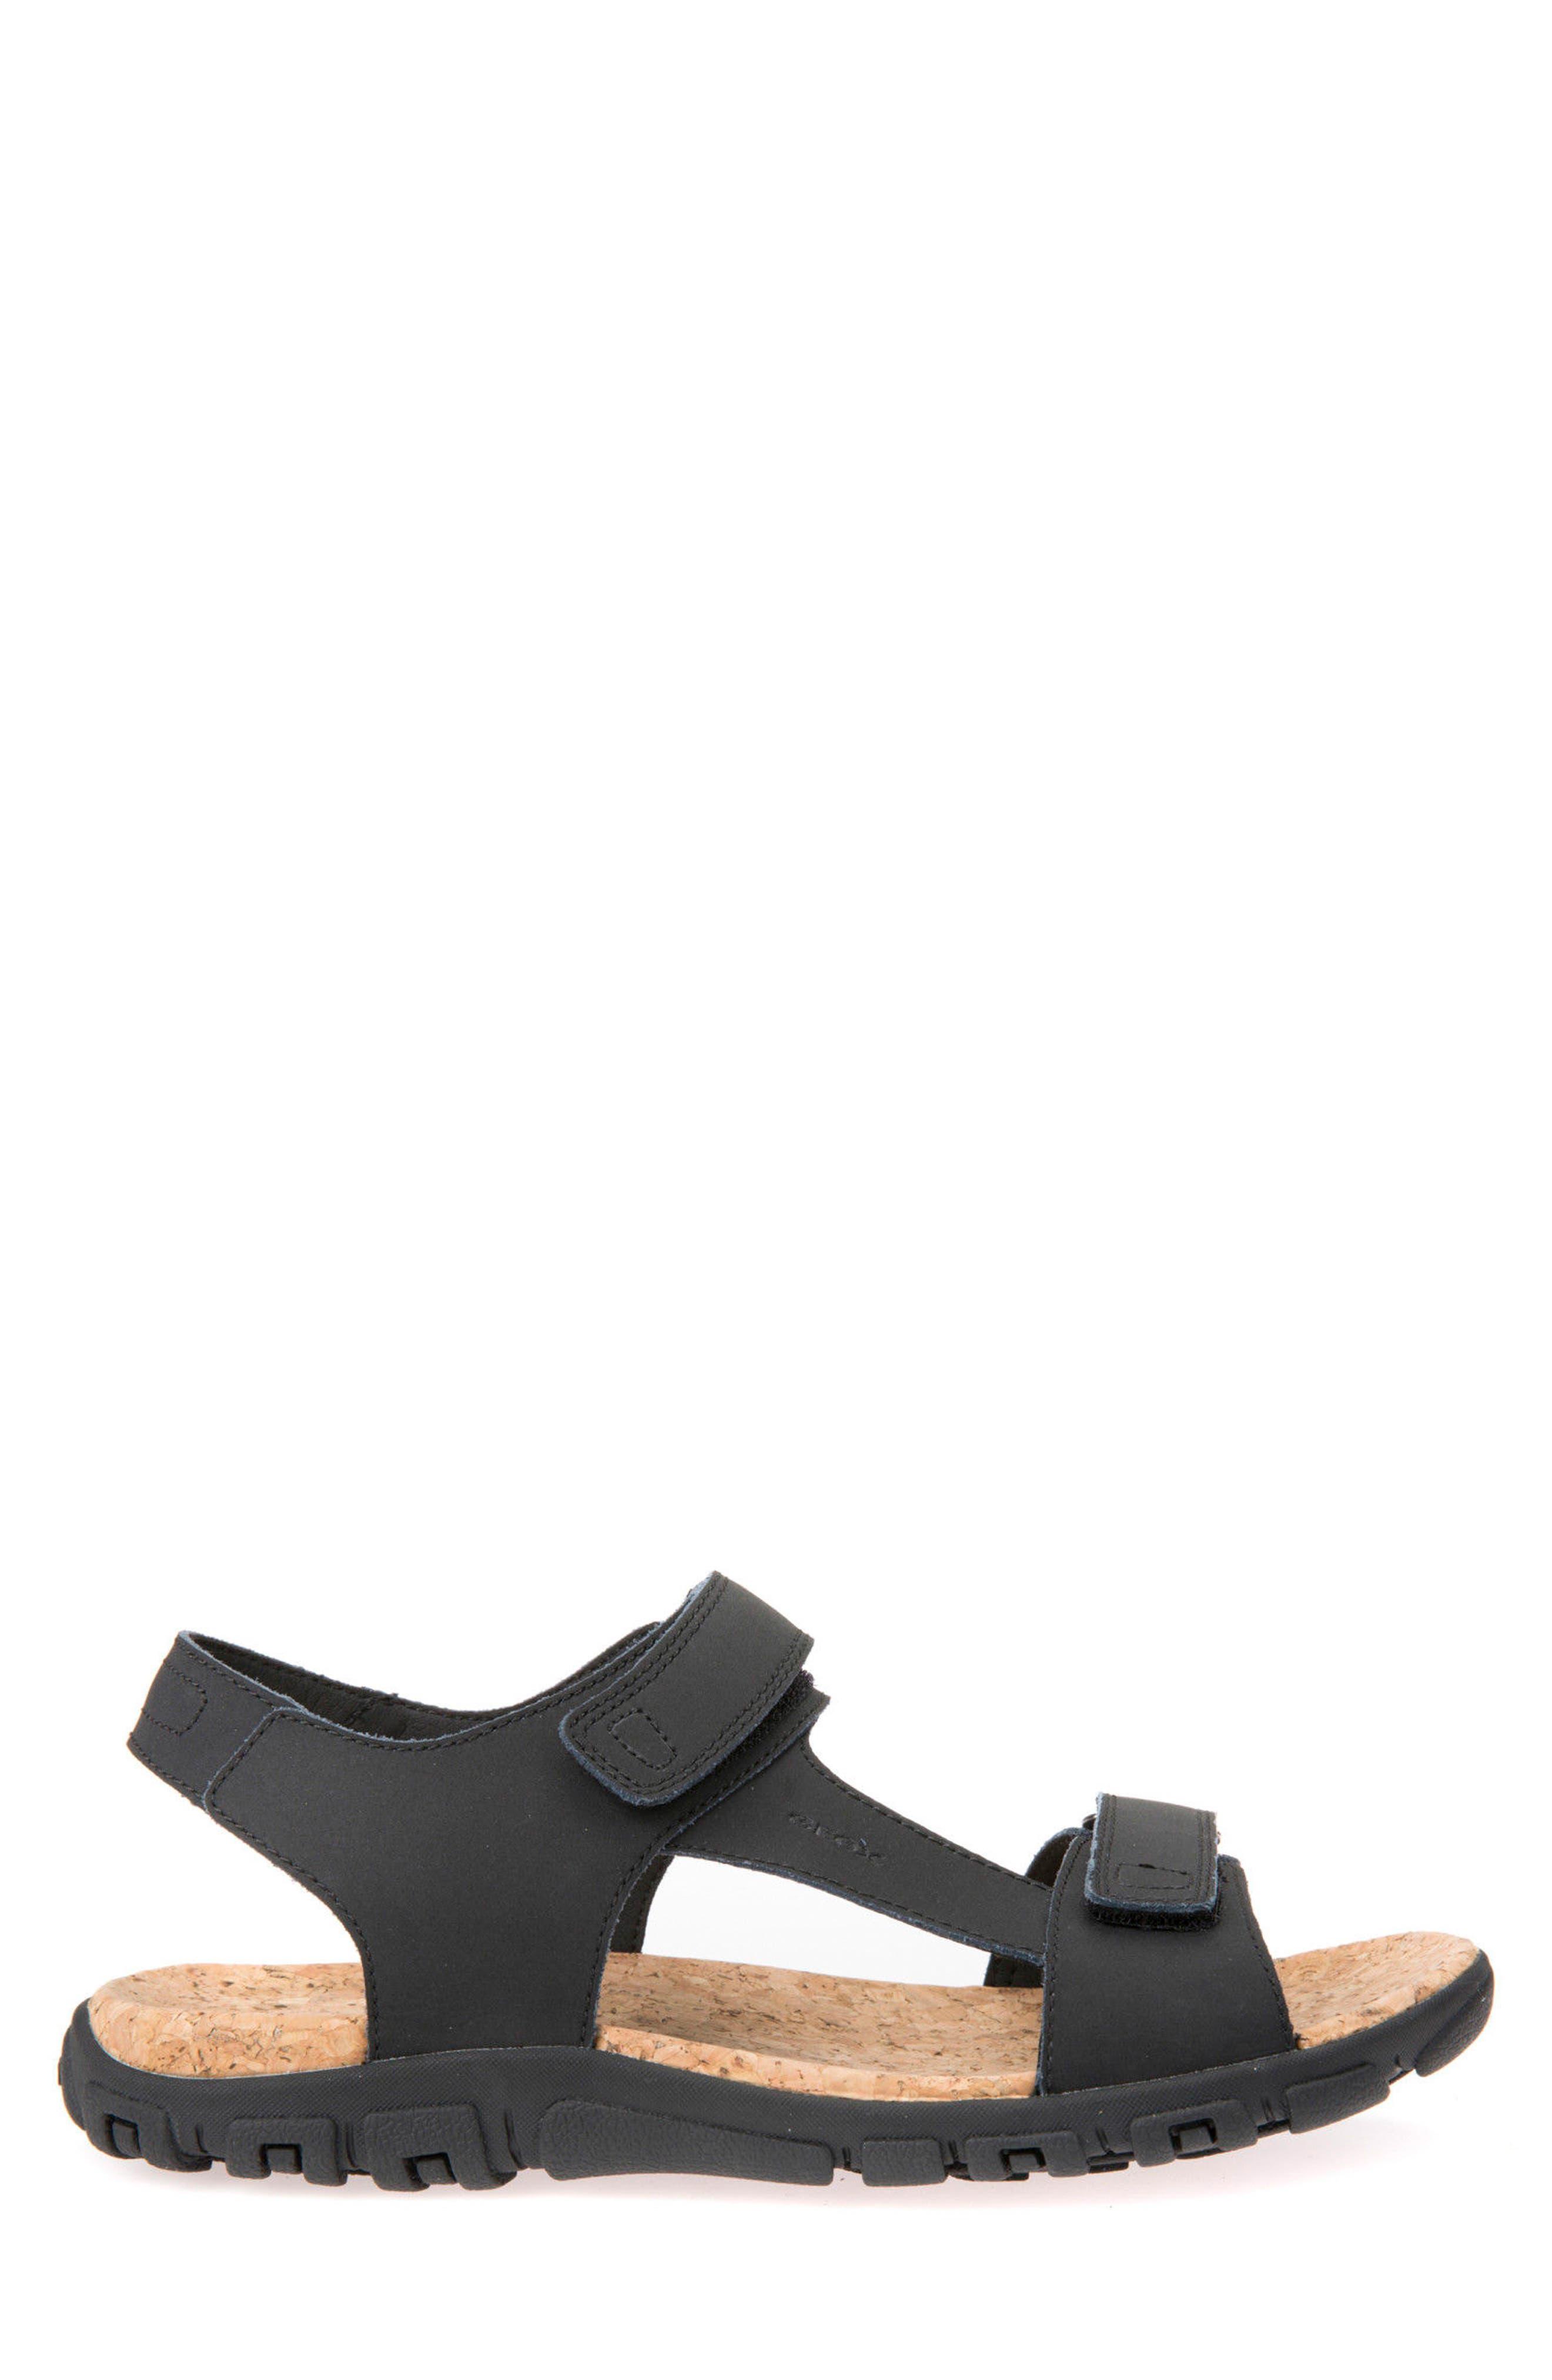 Strada 26 Sport Sandal,                             Alternate thumbnail 3, color,                             Black Leather